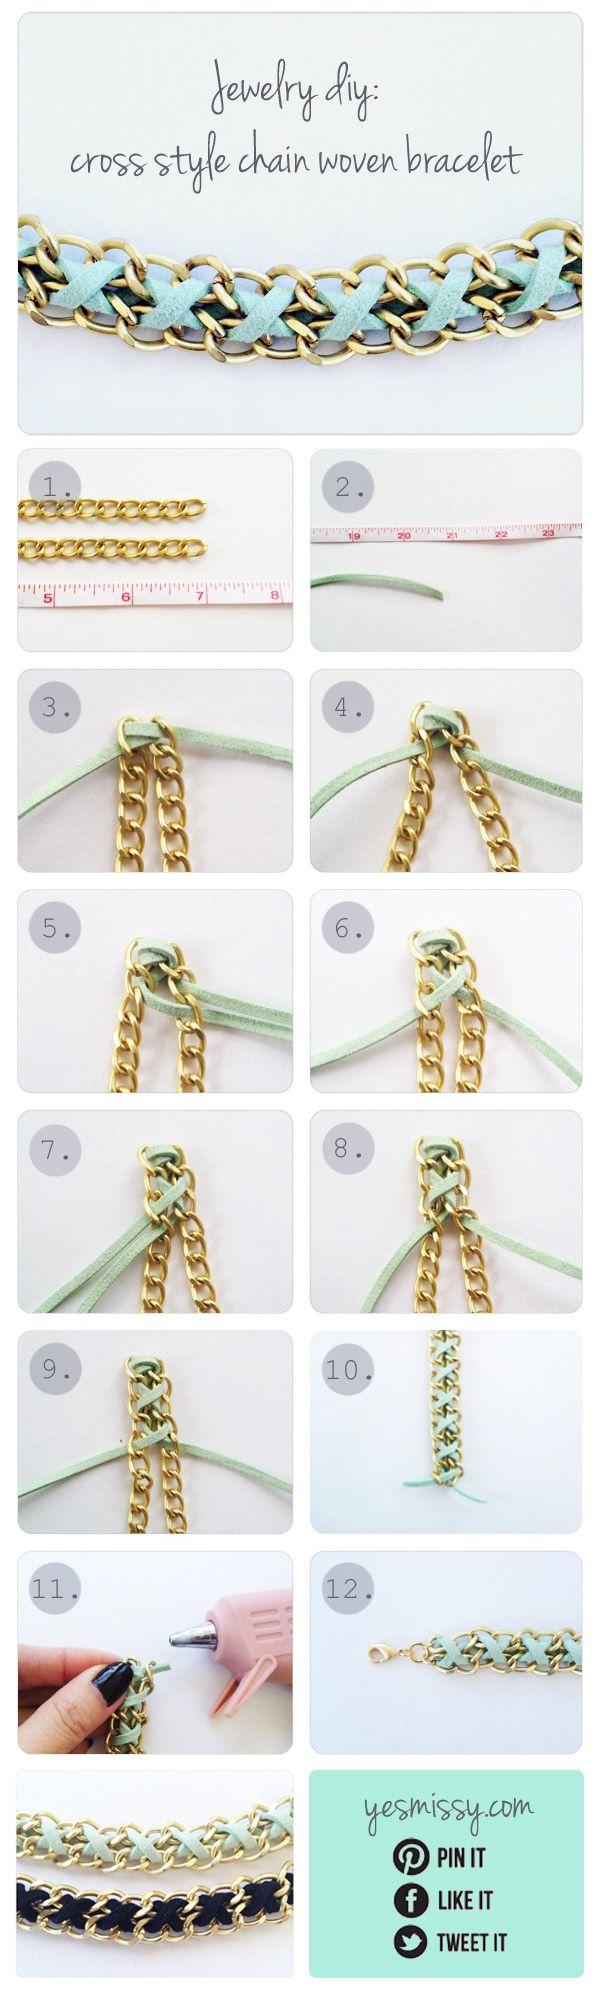 Cross style chain woven bracelet jewelry bracelet diy diy ideas diy crafts do it yourself crafty diy jewelry diy pictures cross style